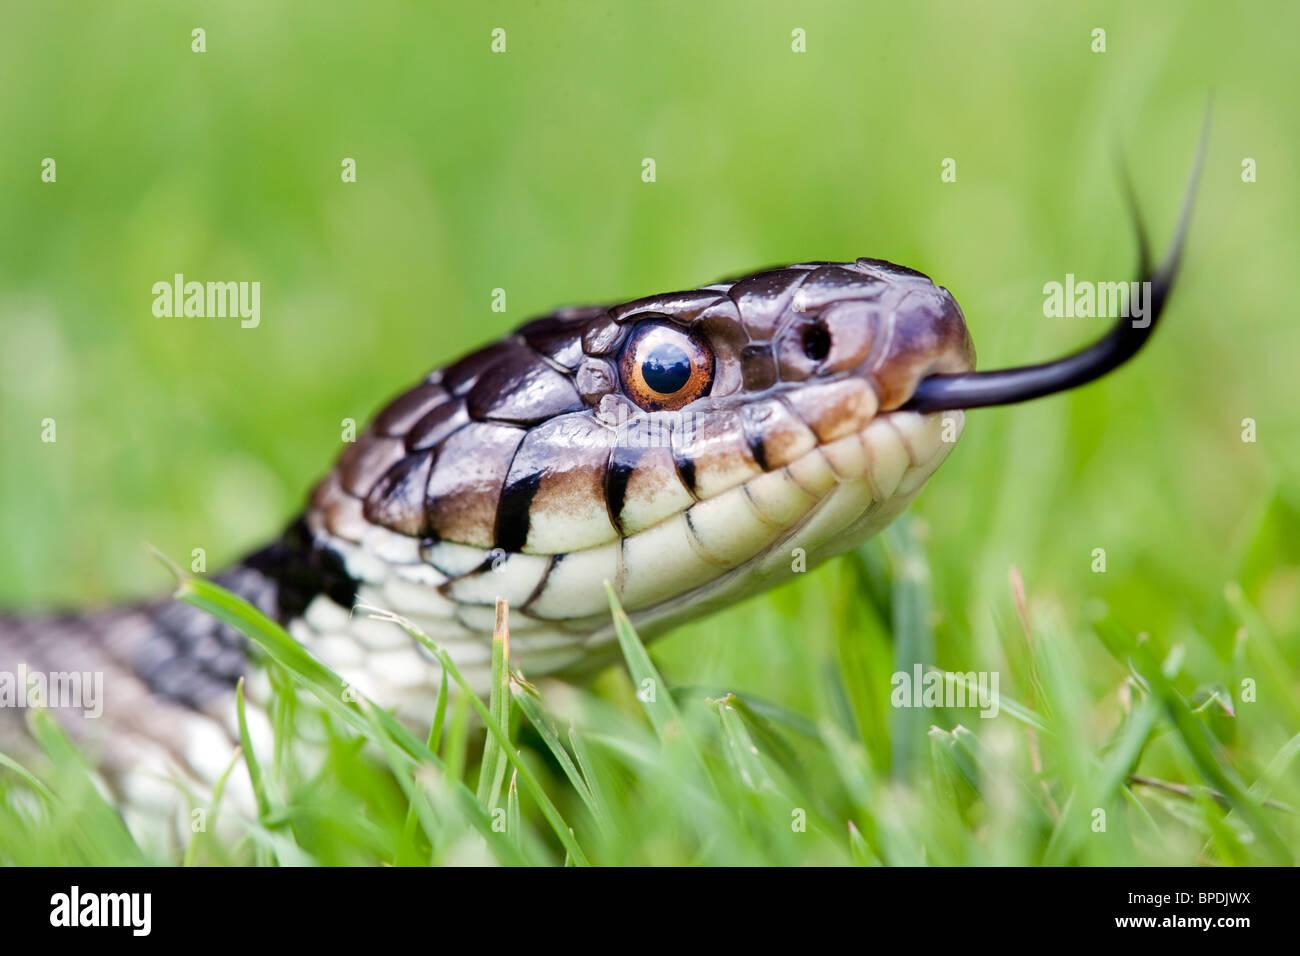 Culebra; Natrix natrix; moviendo la lengua en el césped Imagen De Stock